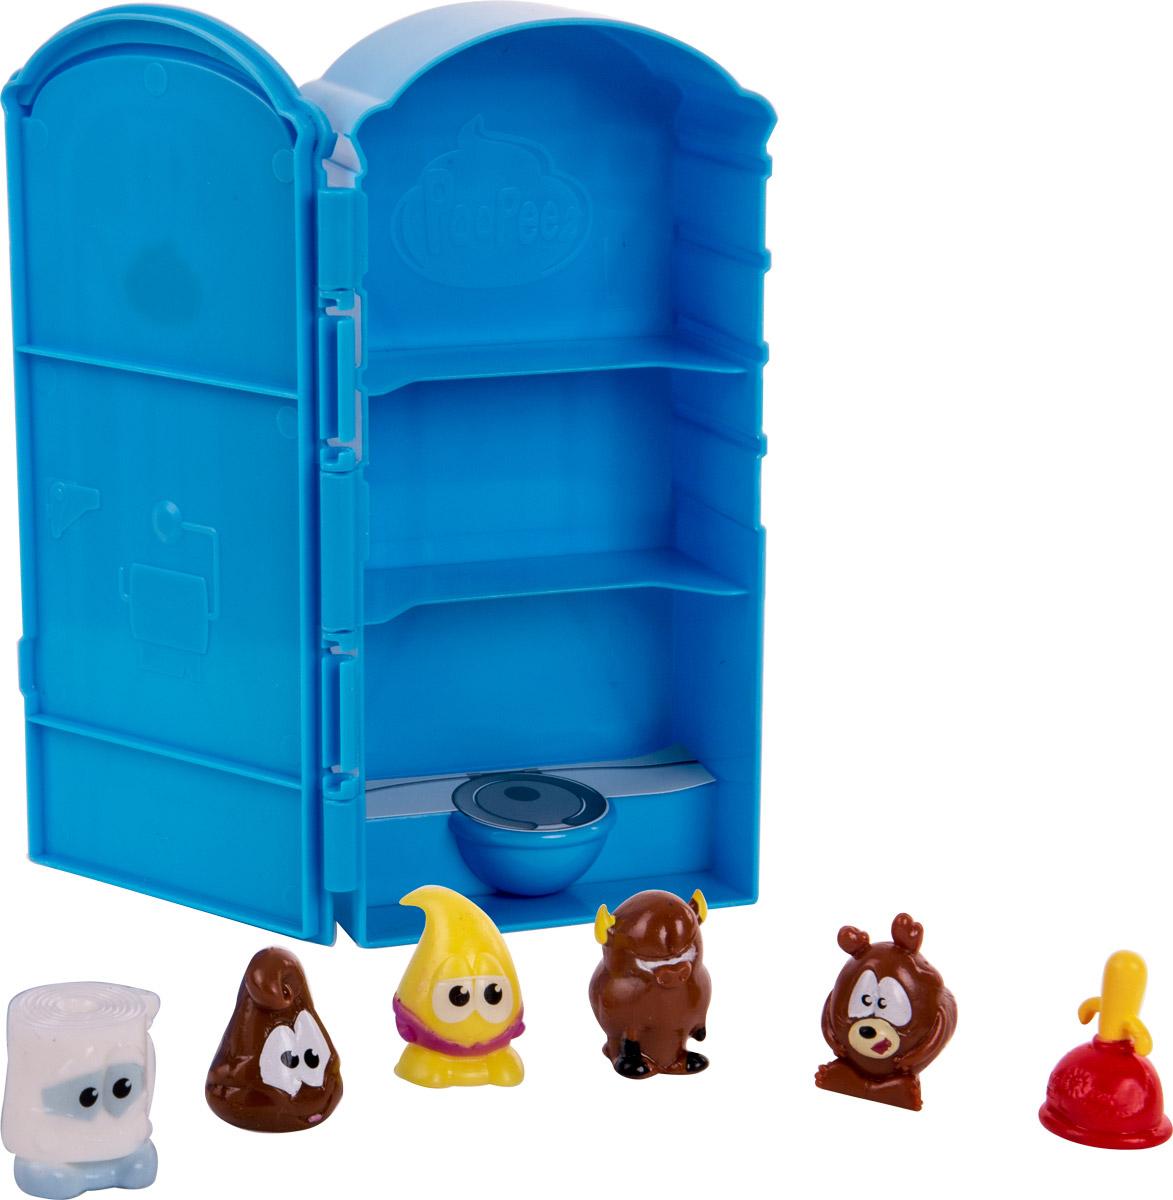 Poopeez Игровой набор Туалетная кабинка с фигурками набор фигурок cut the rope 2 pack 9